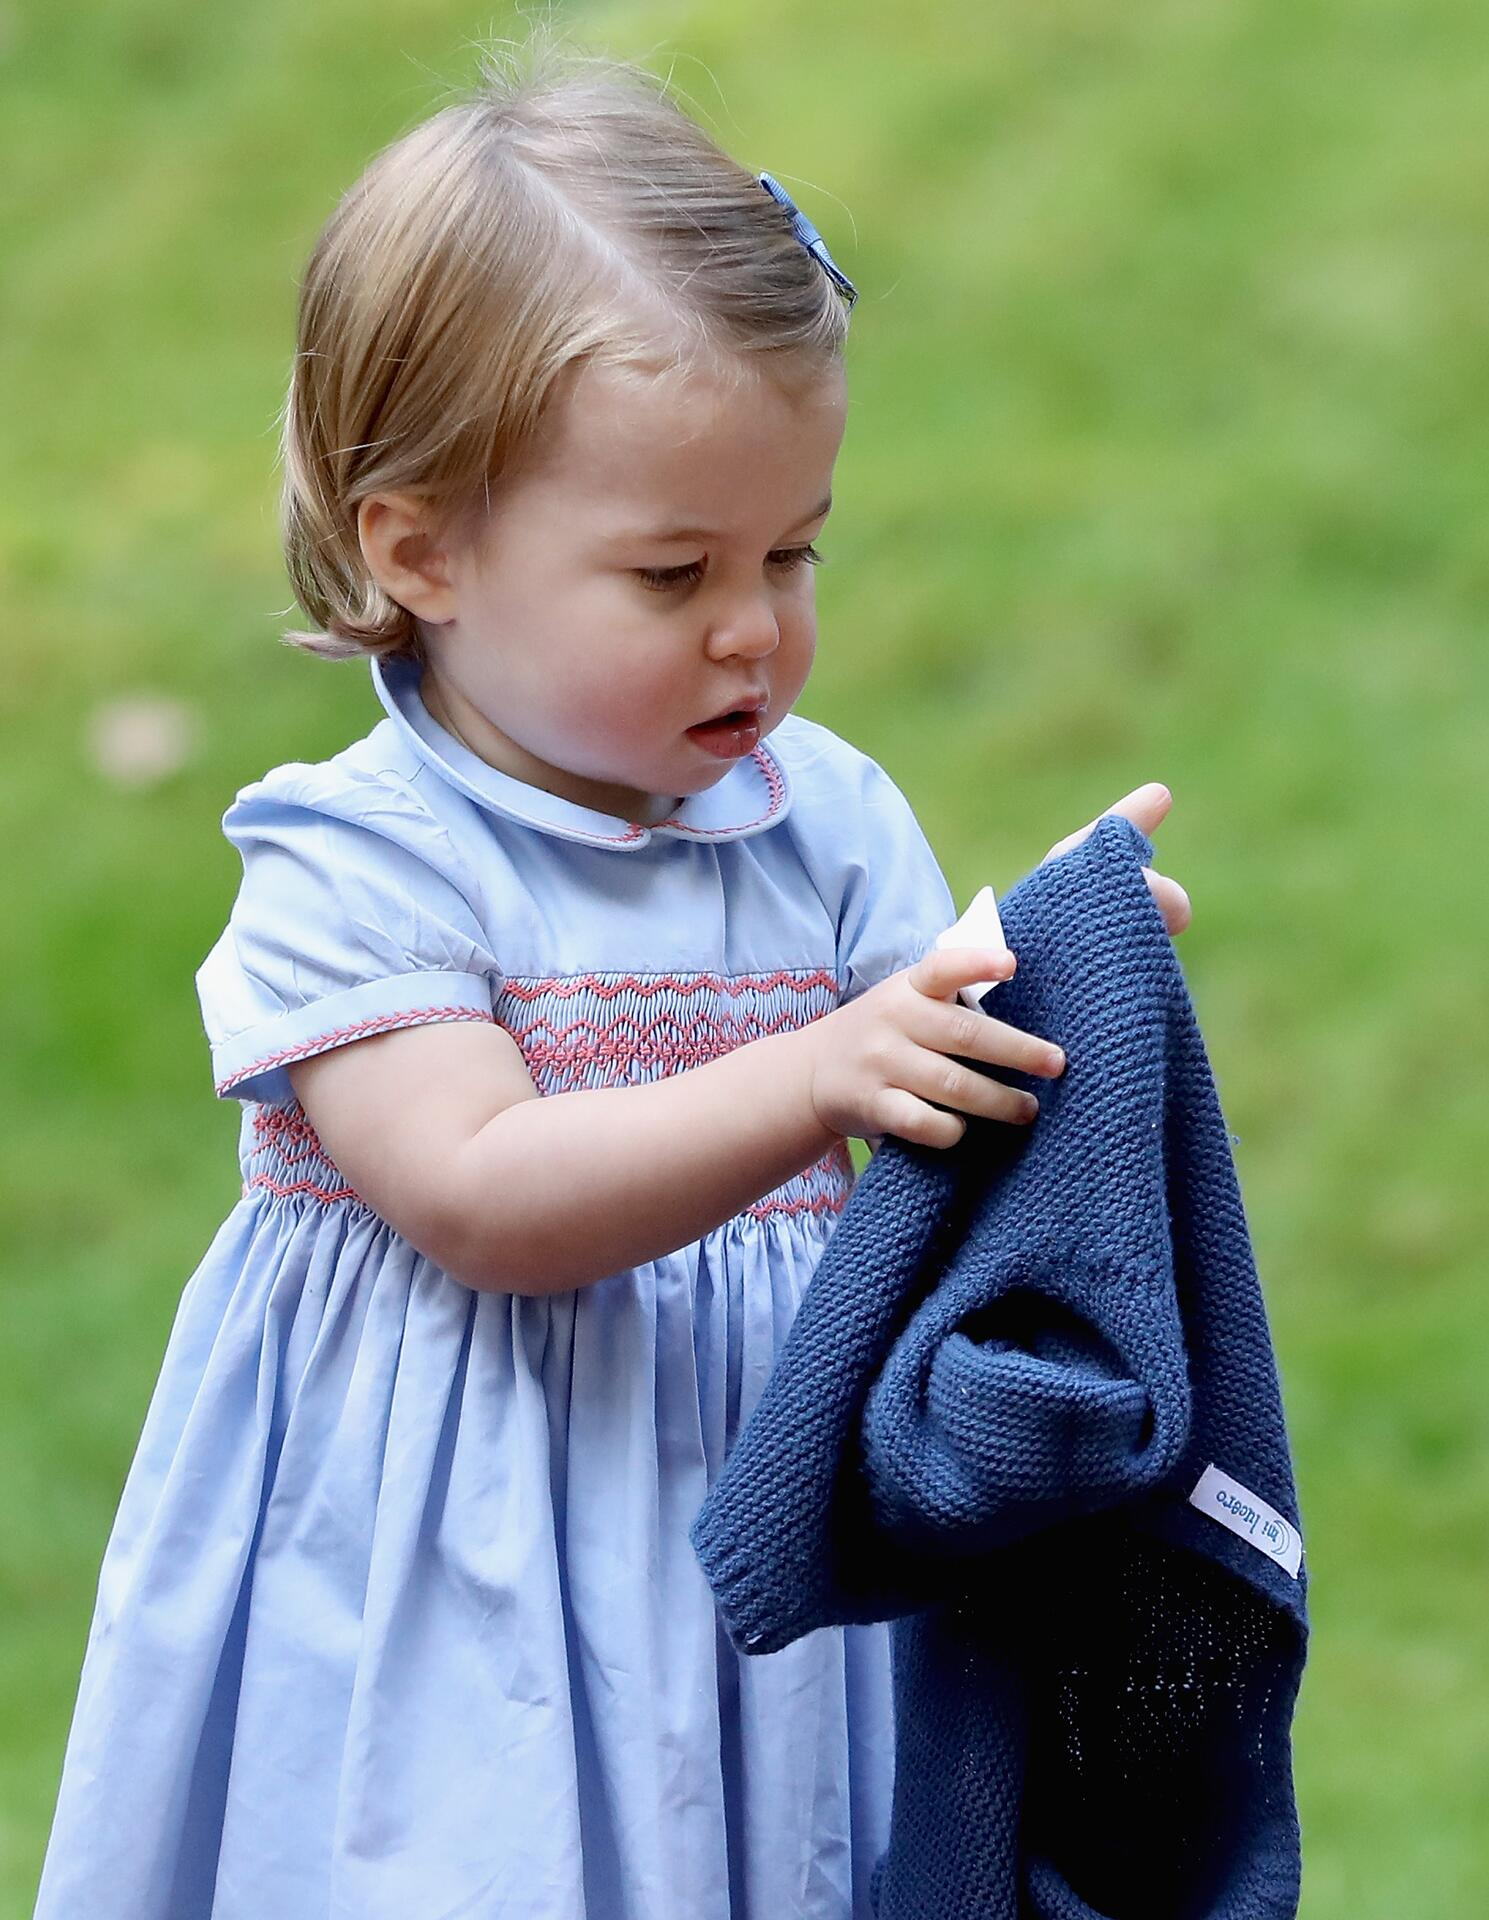 Bild zu Prinzessin Charlotte